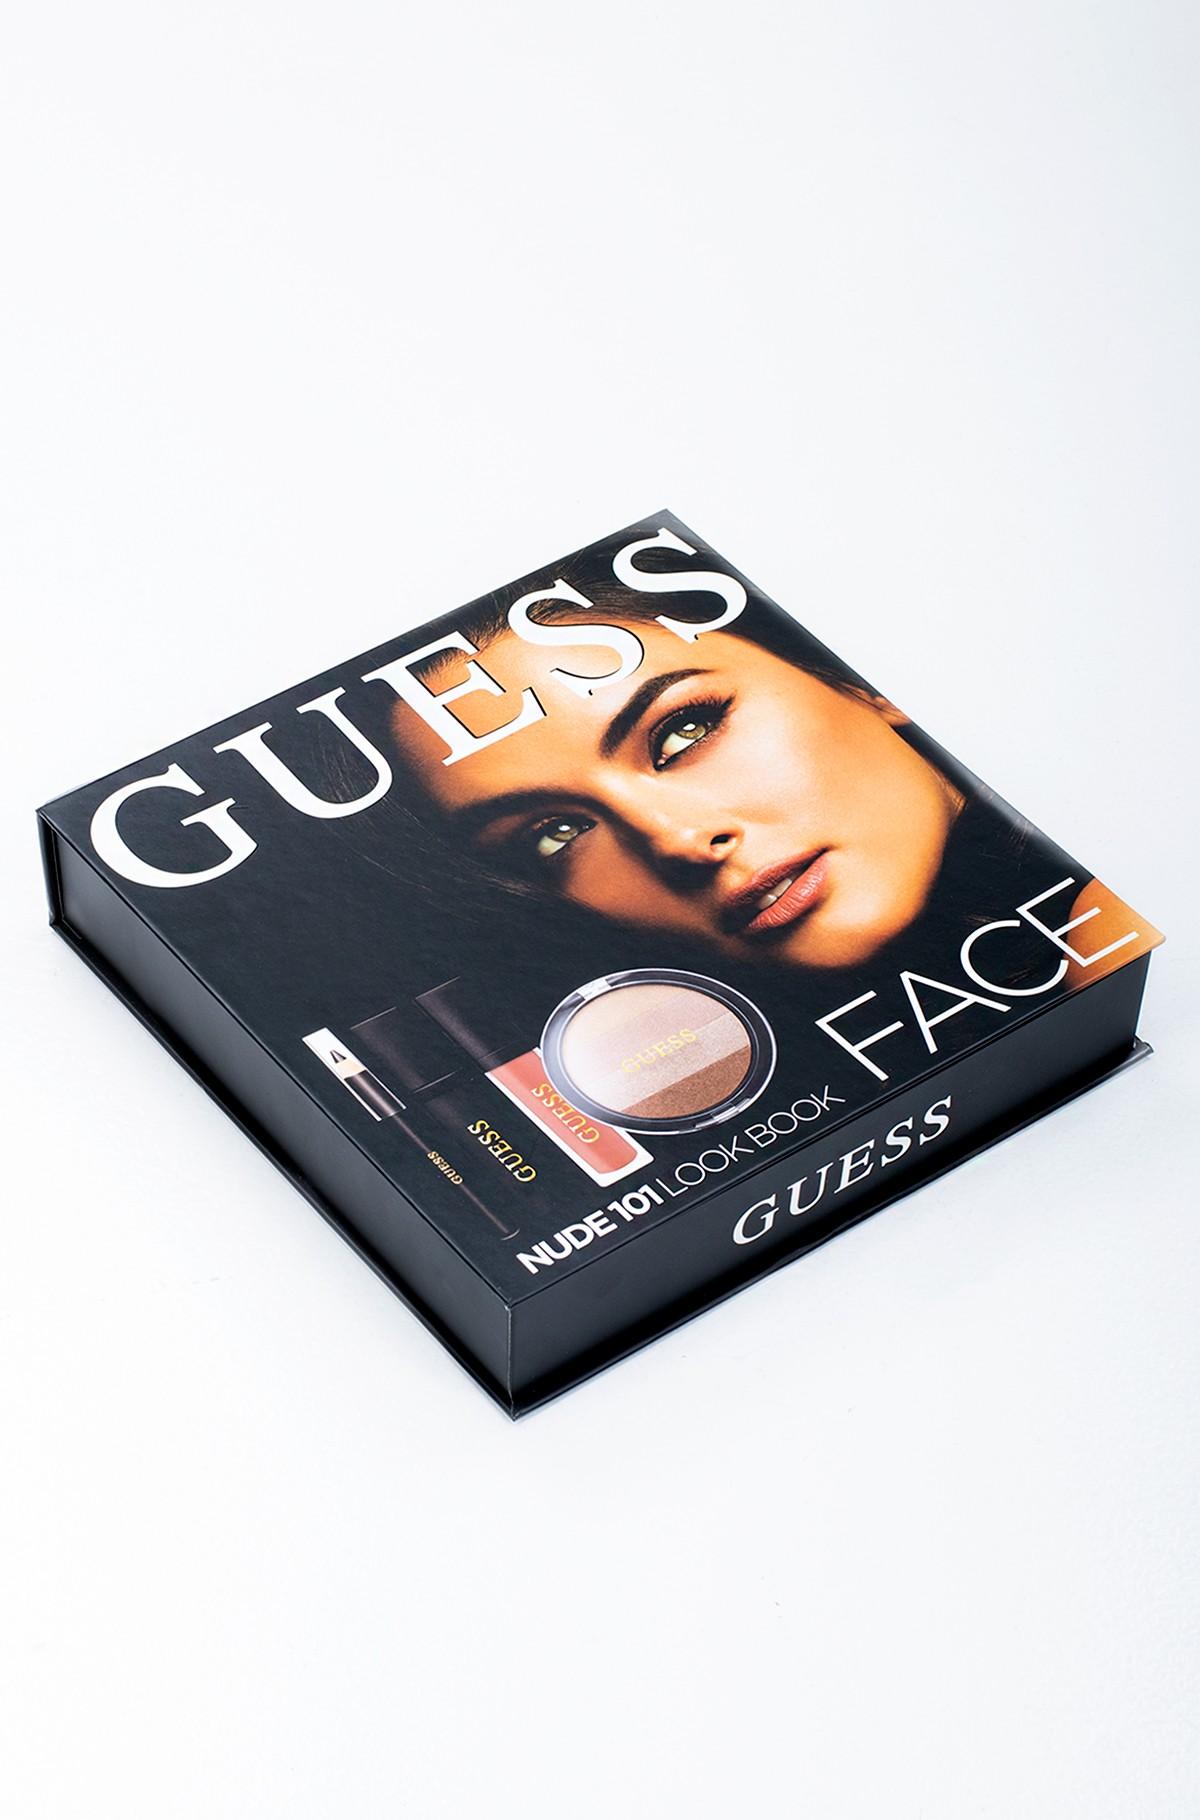 Kosmeetika komplekt Guess Season 1 Nude 101 FACE KIT-full-1